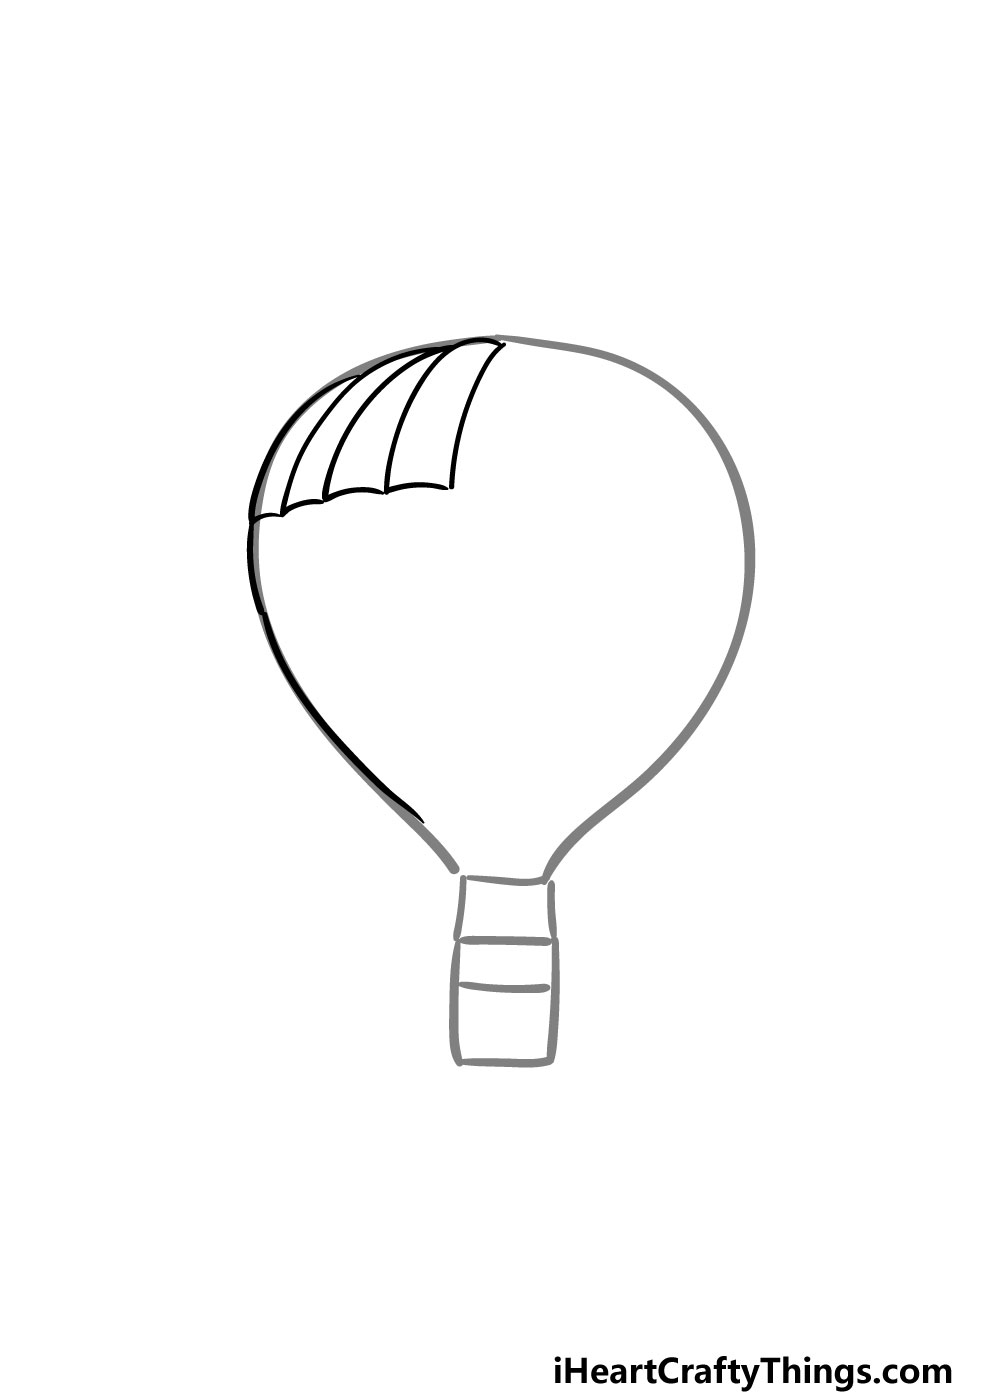 drawing a hot air balloon step 1